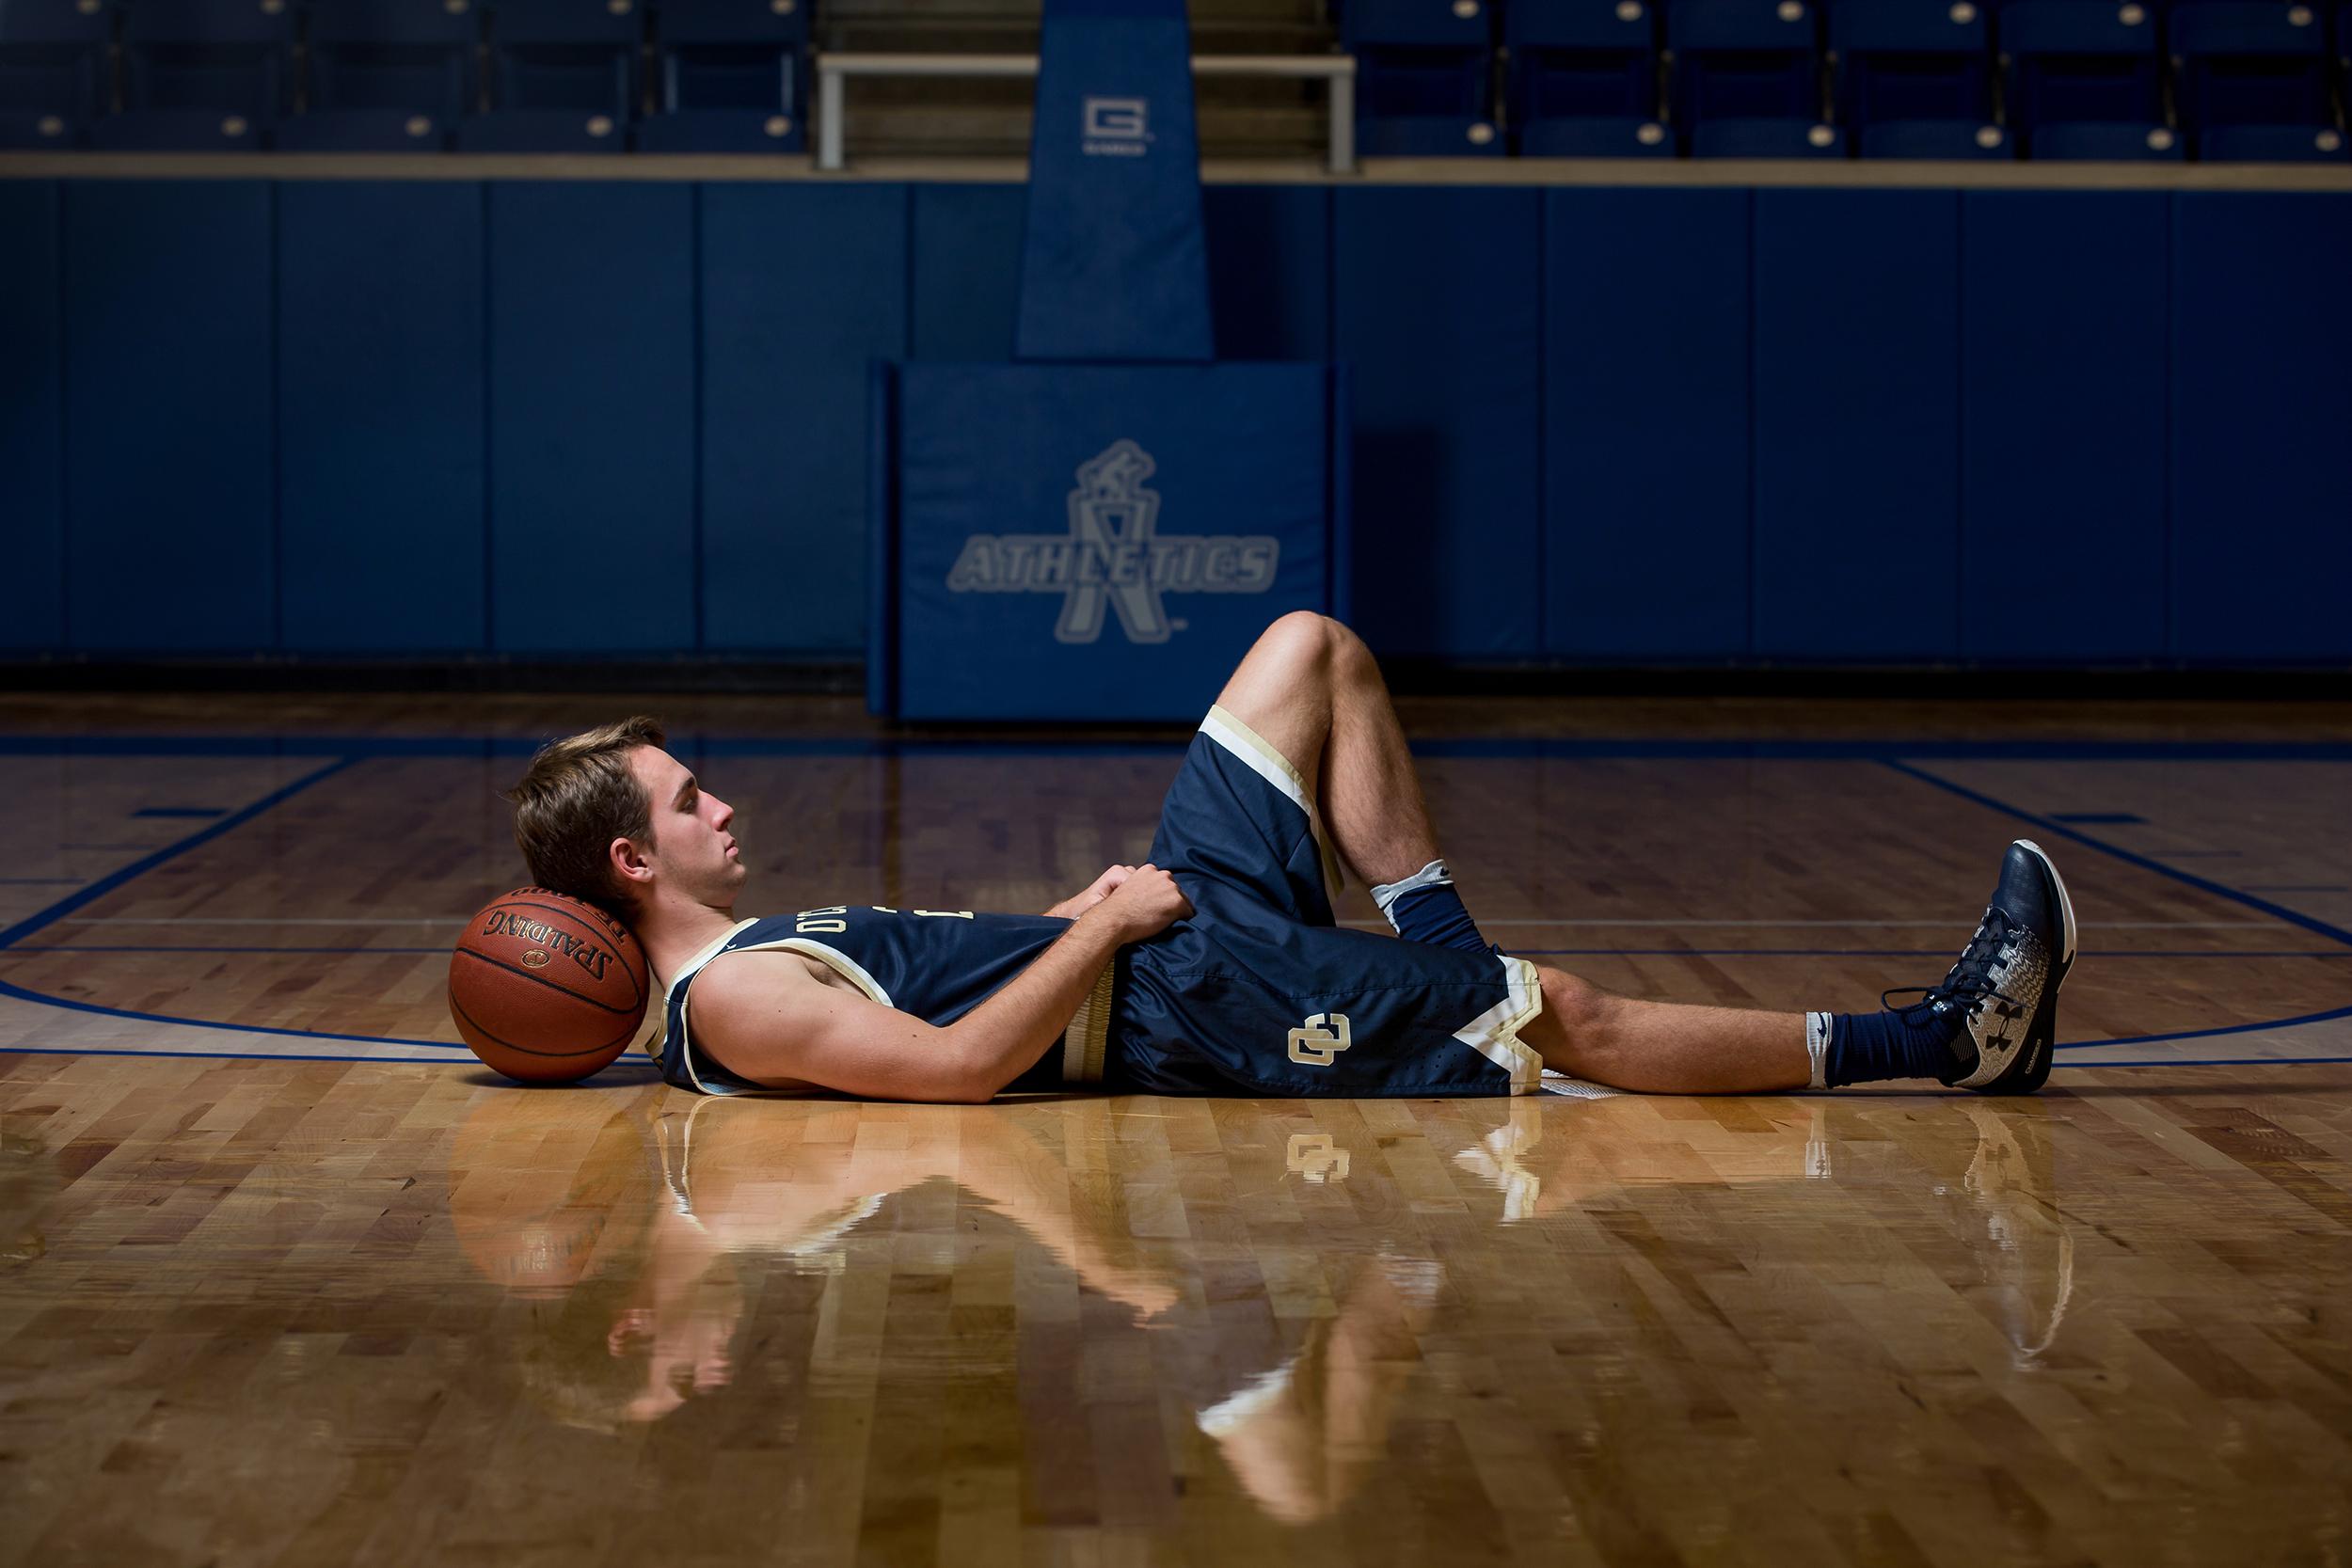 Senior-boy-basketball-laying-reflection-court.jpg